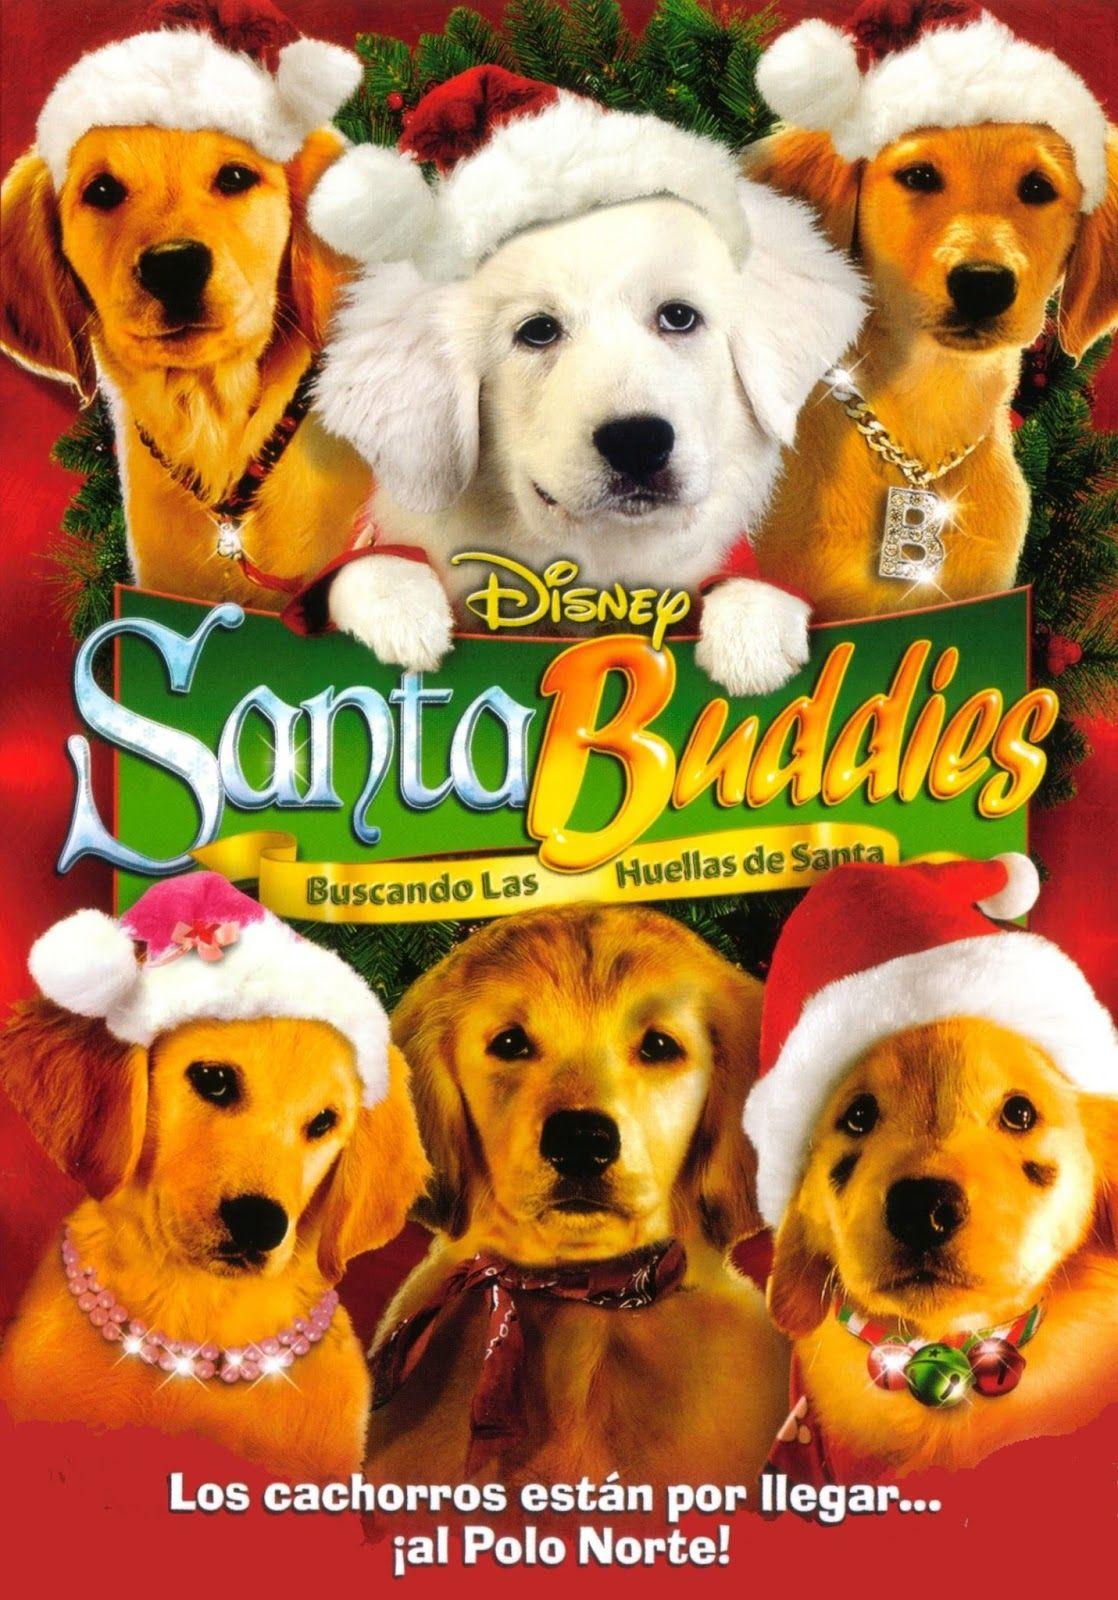 Filme Online Hd Subtitrate Colectia Ta De Filme Alese Santa Buddies 2009 Căţeii Lui Mos Crăciun O Kids Christmas Movies Best Christmas Movies Kid Movies